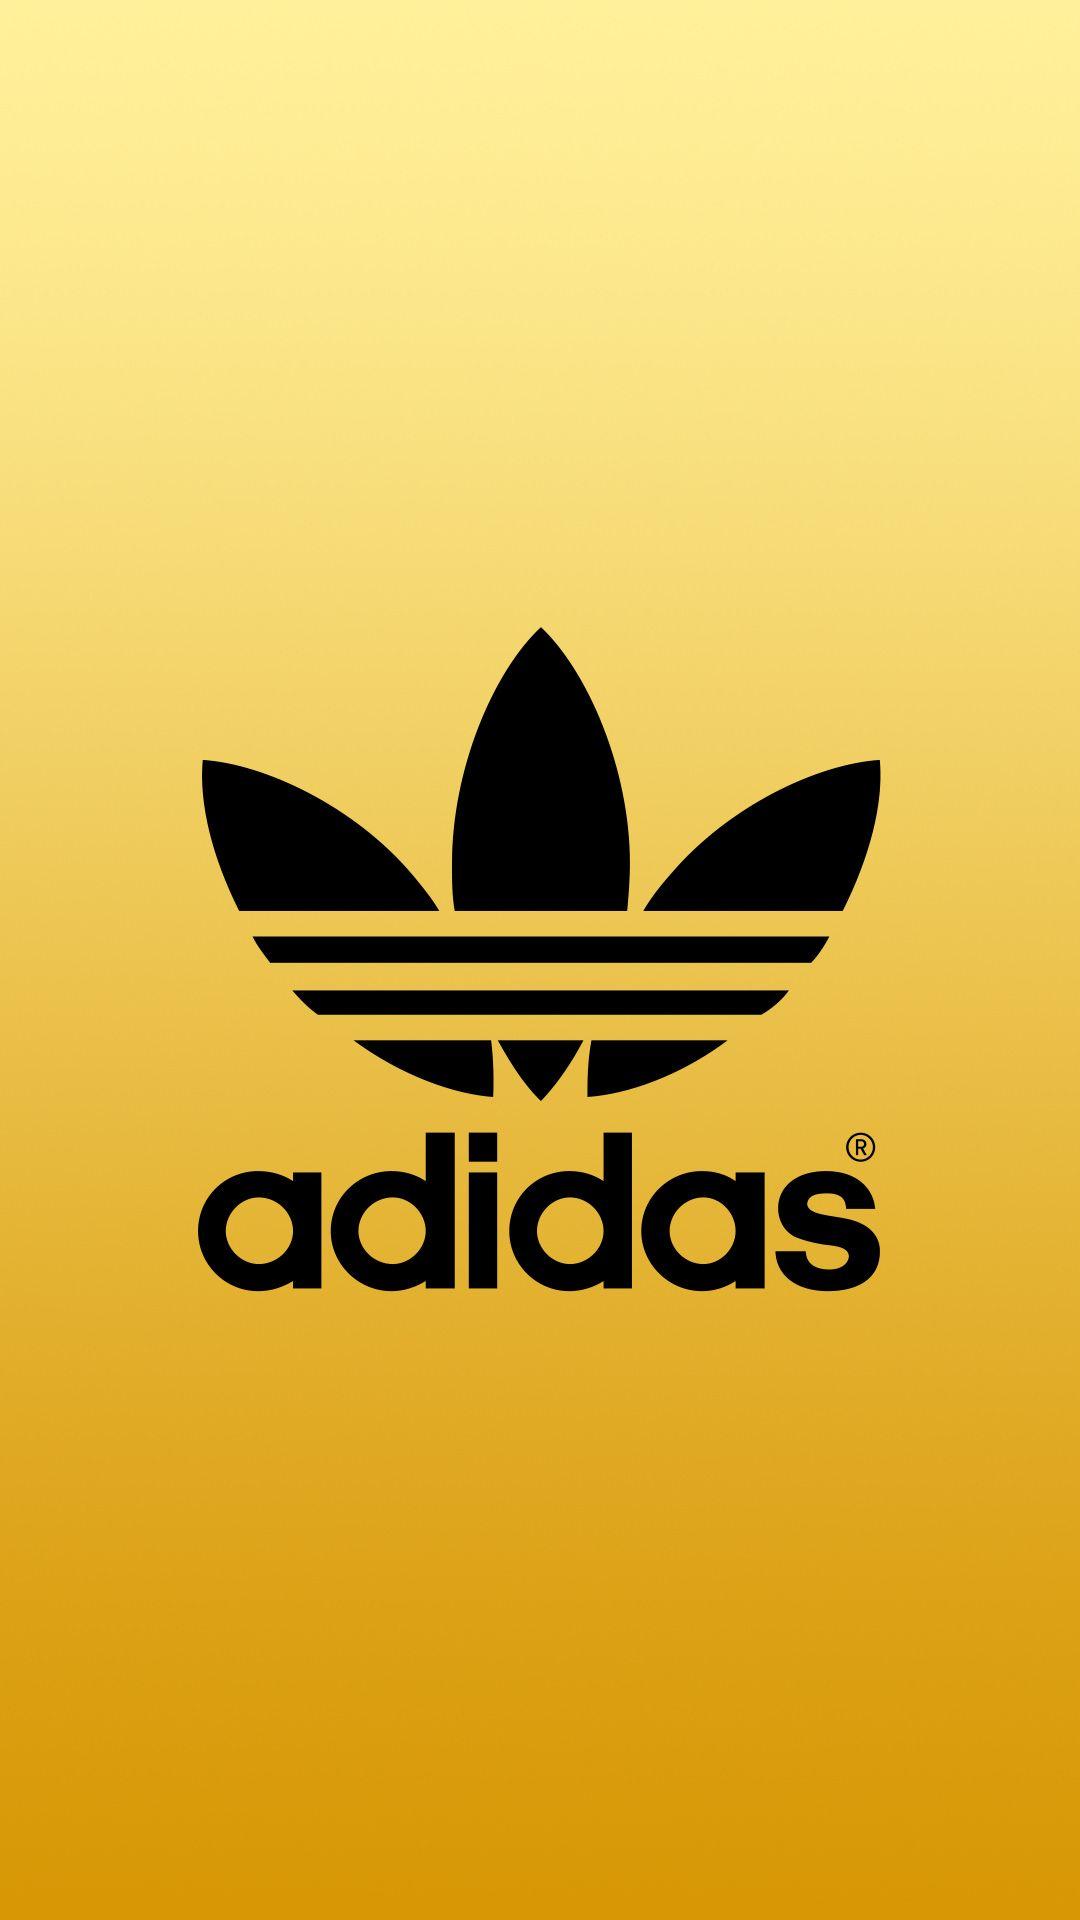 Adidas アディダス の高画質スマホ壁紙25枚 アディダス スマホ壁紙 壁紙